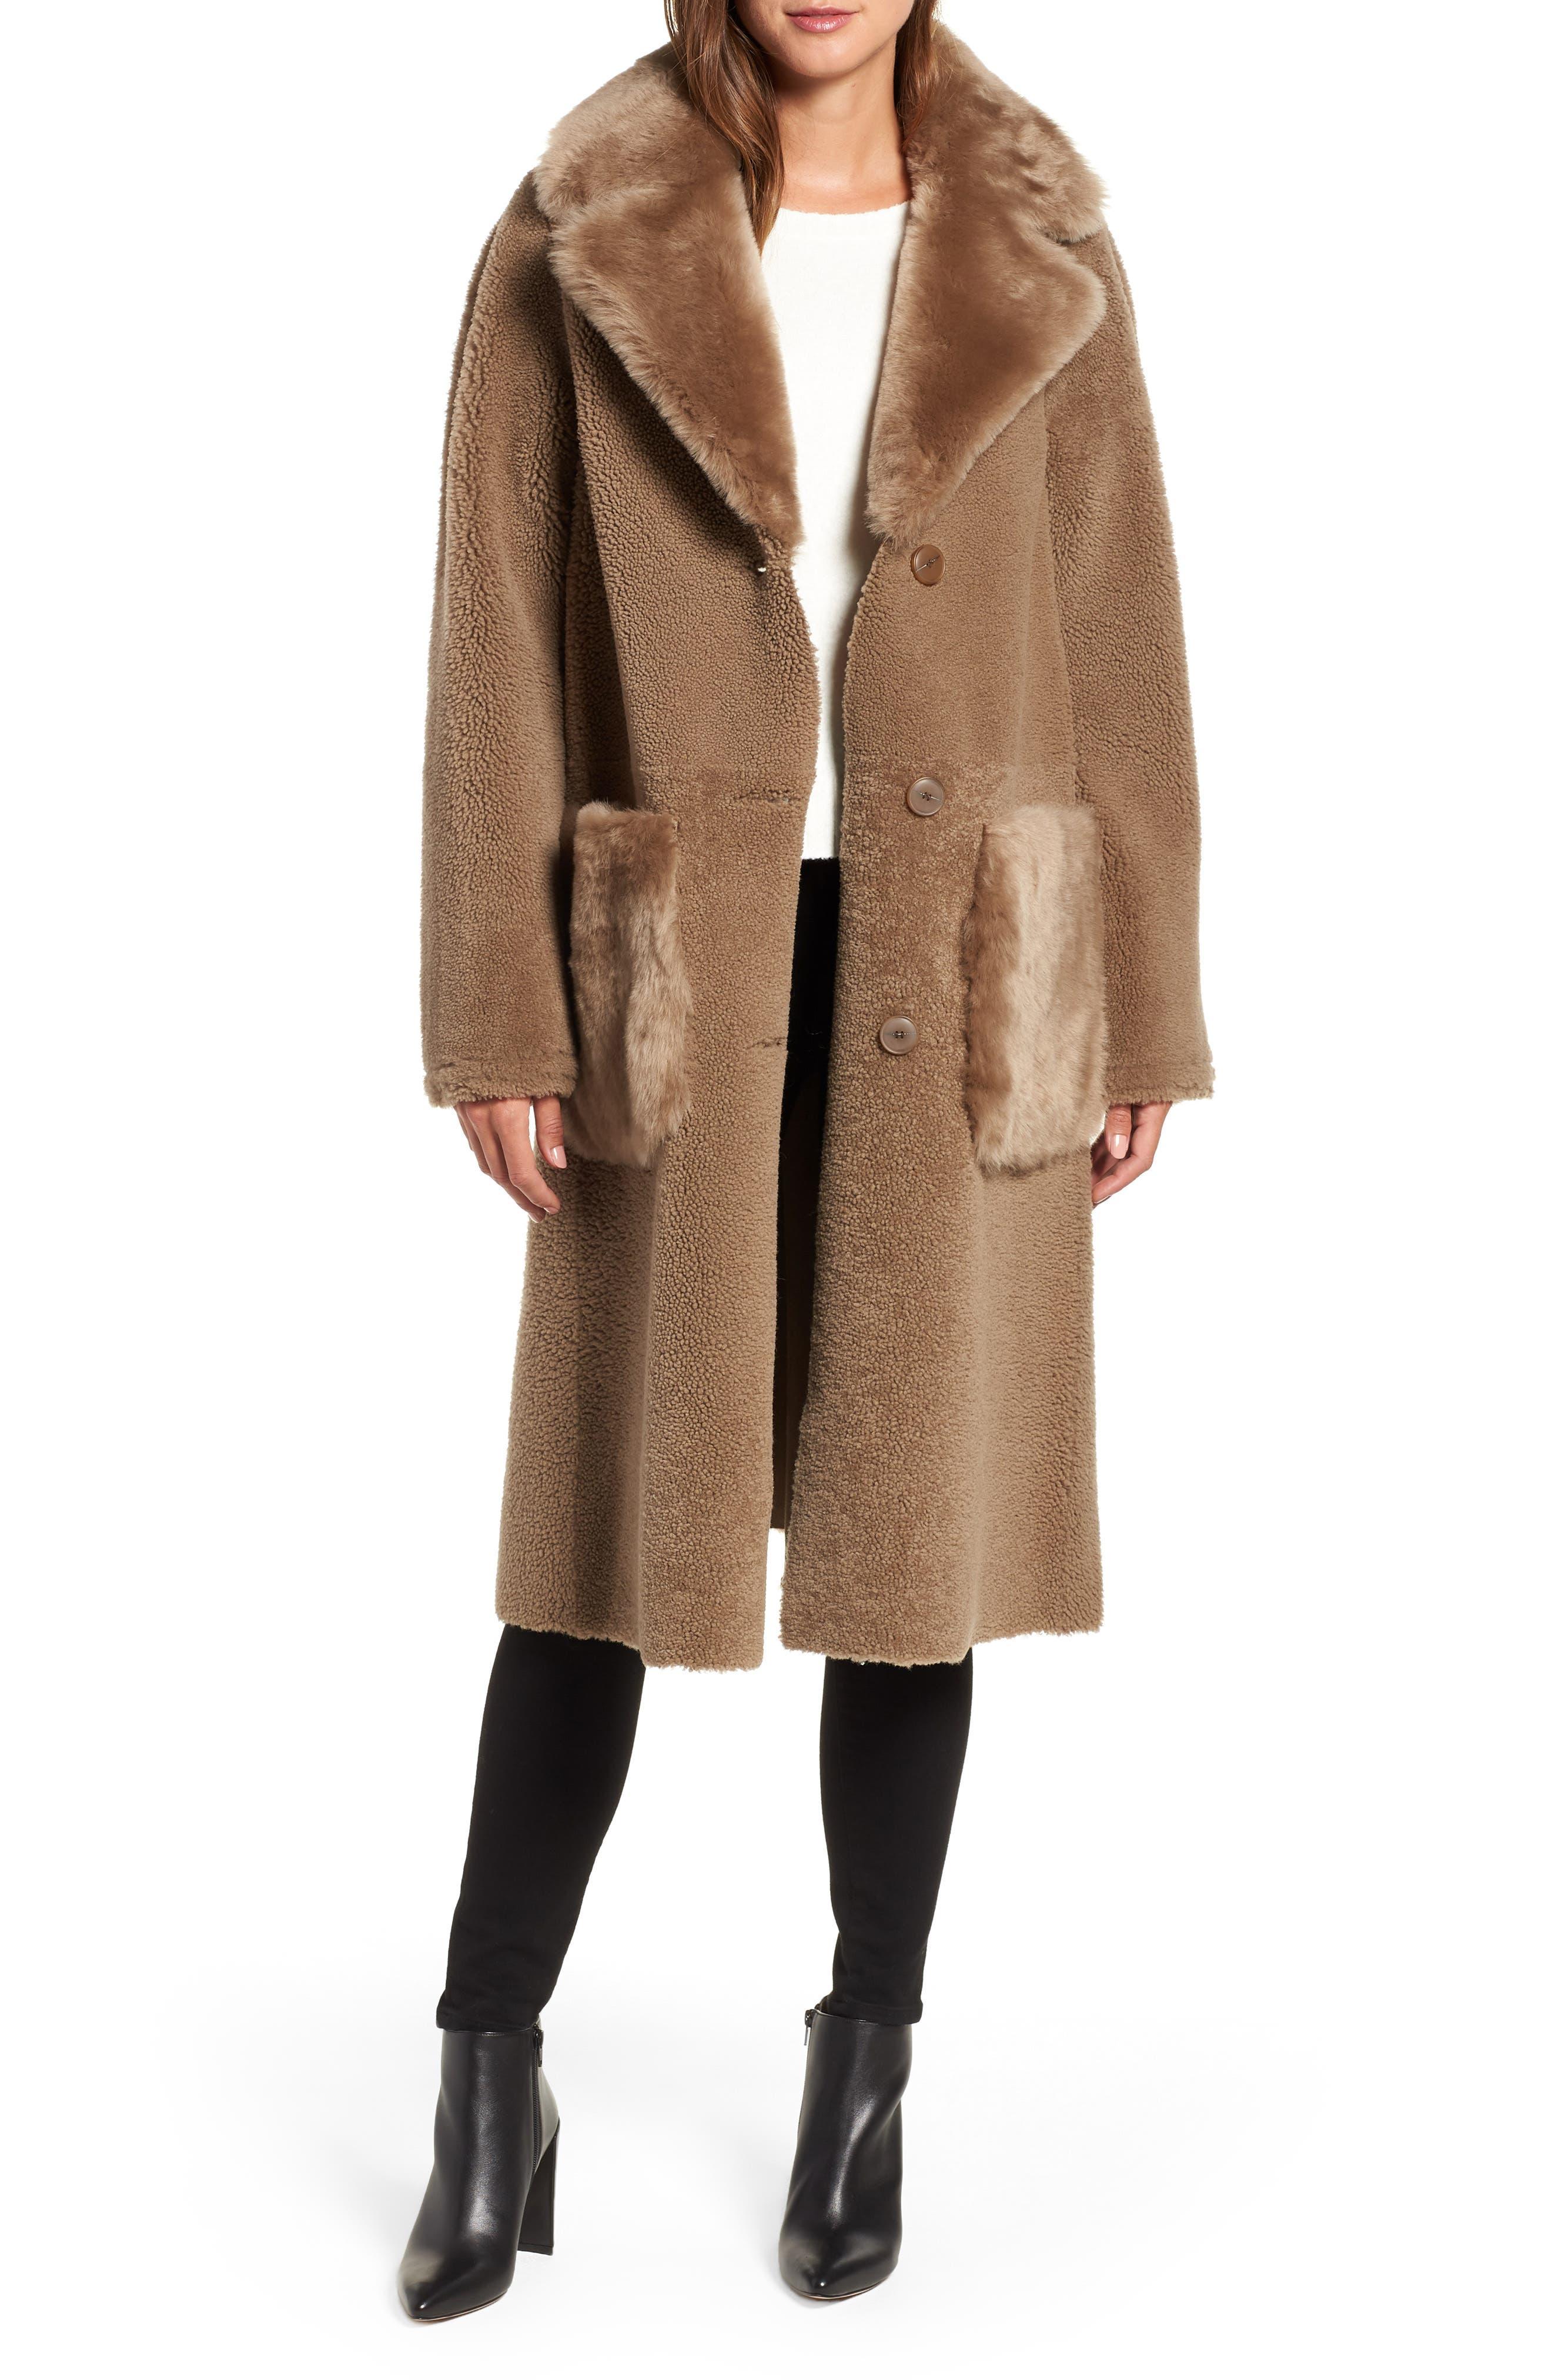 Hiso Genuine Merino Shearling Coat, Beige